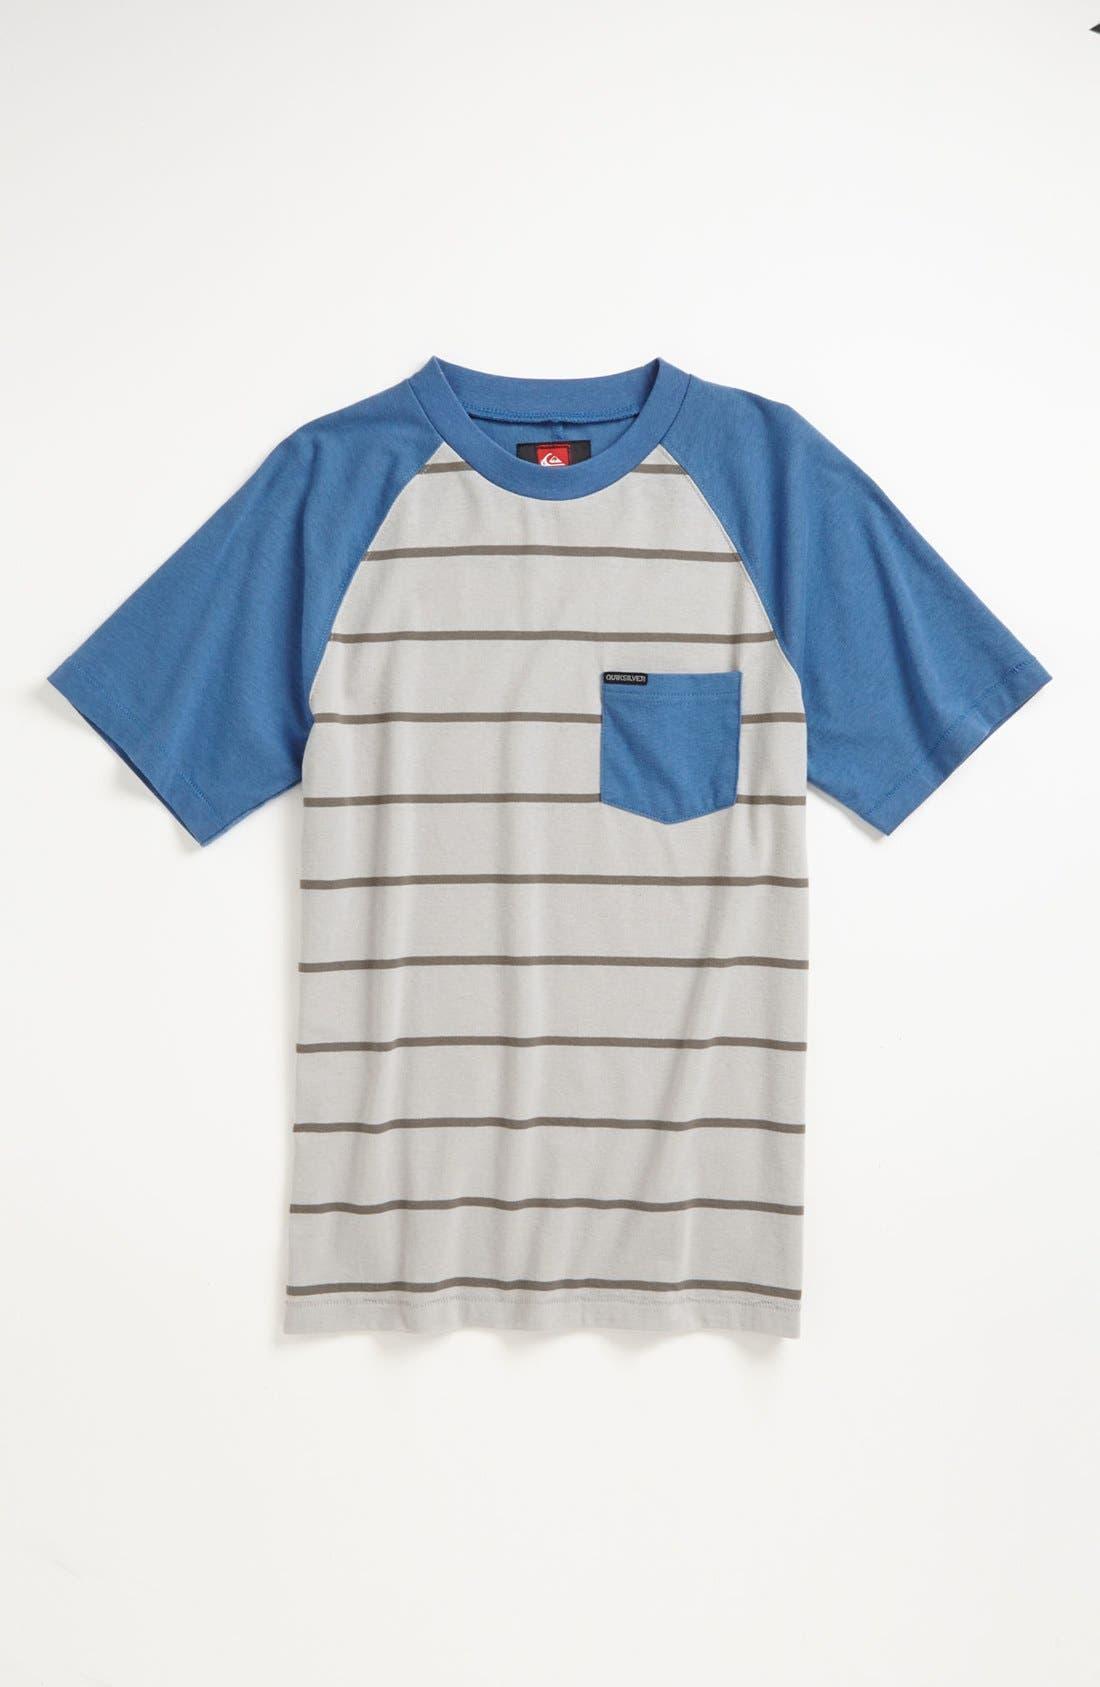 Alternate Image 1 Selected - Quiksilver 'Lennox' T-Shirt (Big Boys)